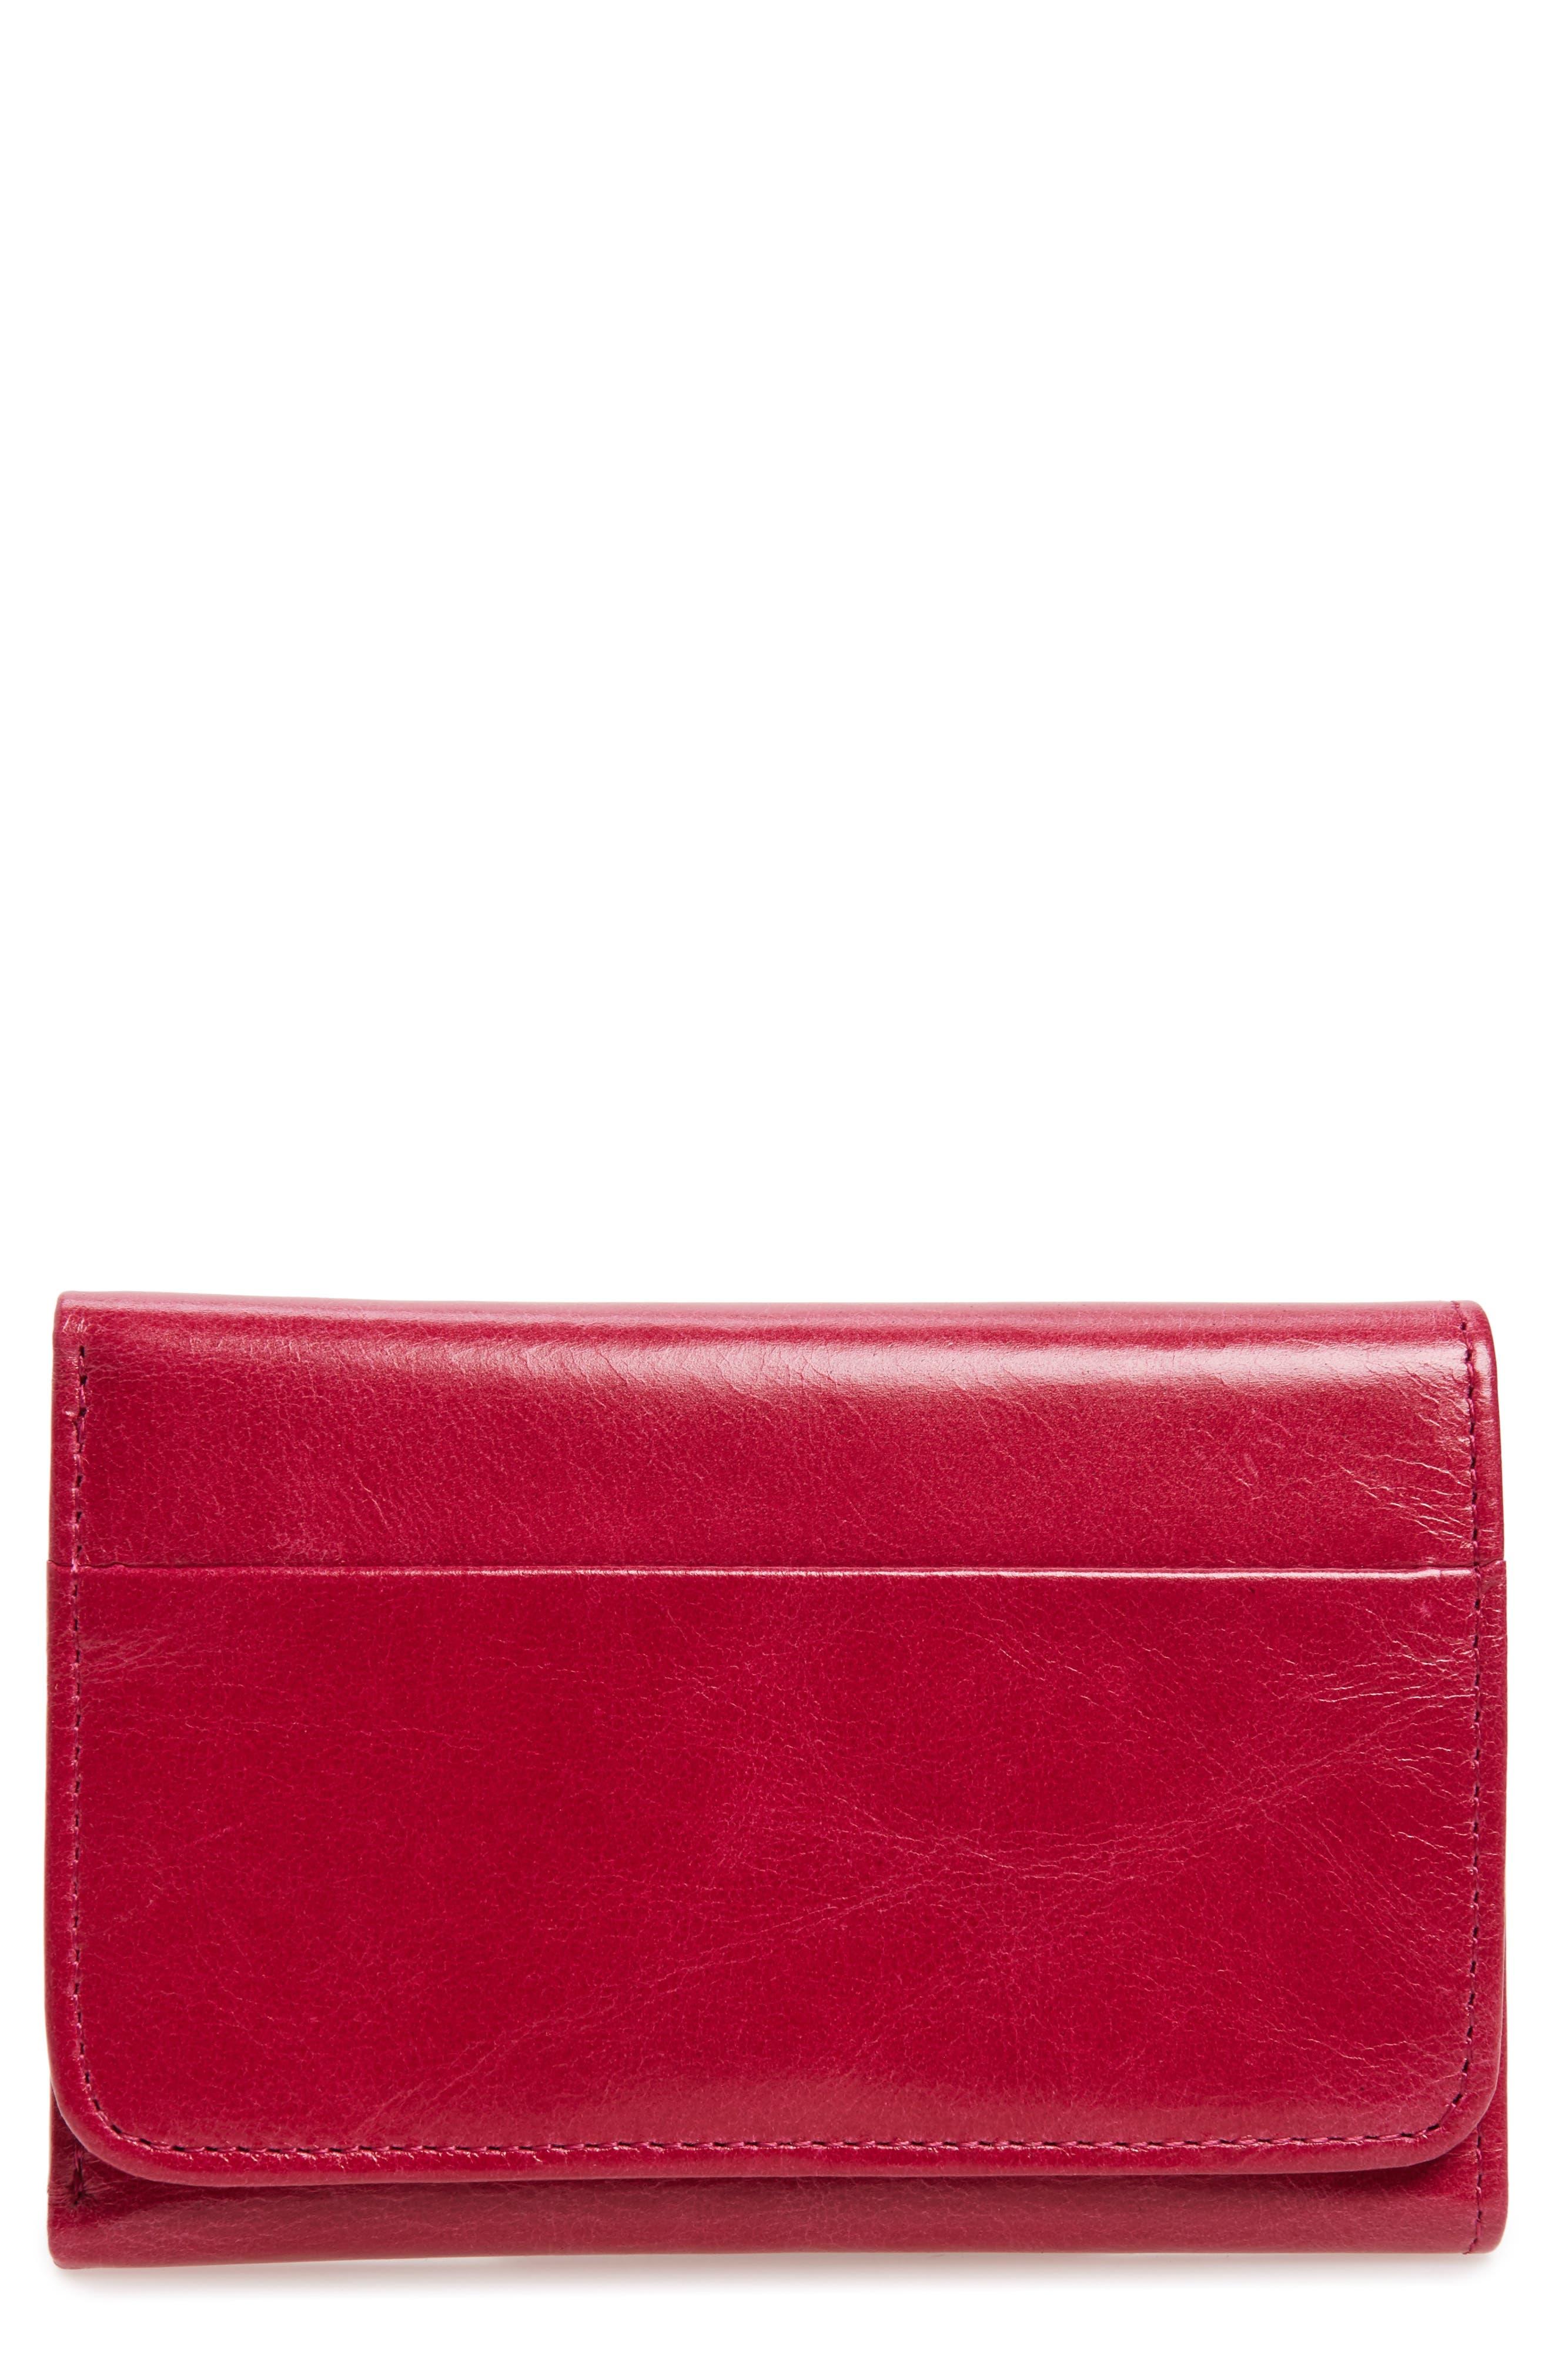 Main Image - Hobo 'Jill' Trifold Wallet